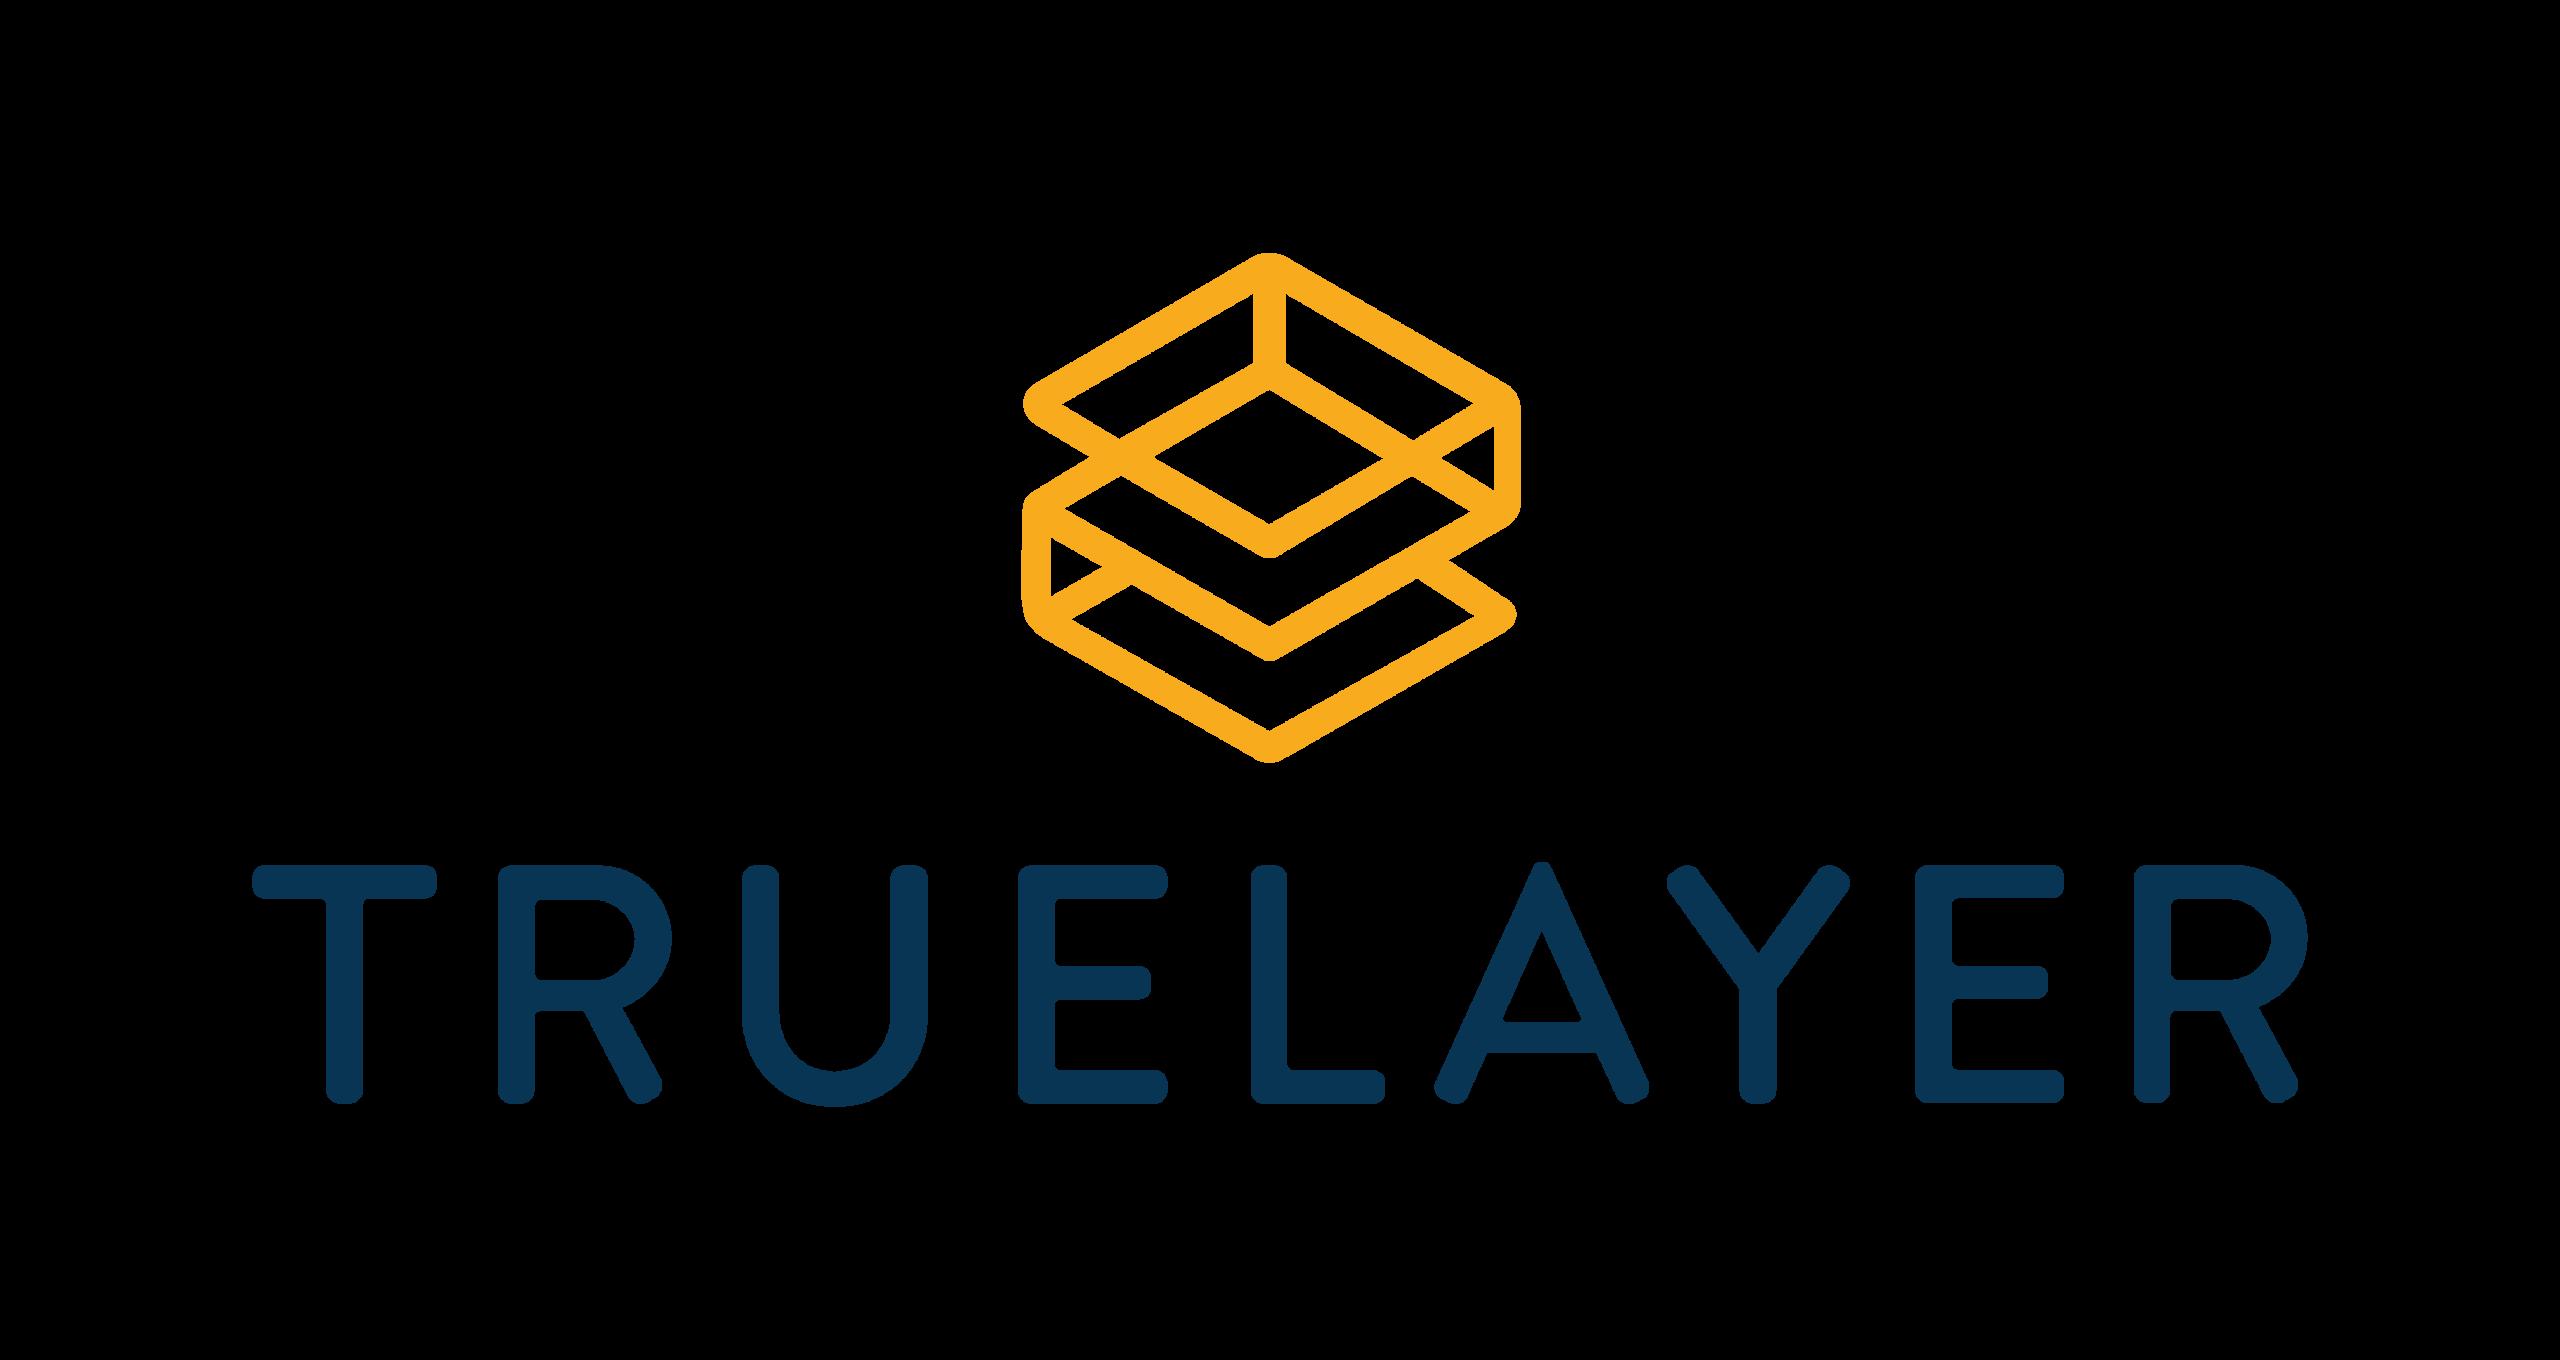 Trading 212 Integrates TrueLayer's Open Banking Platform